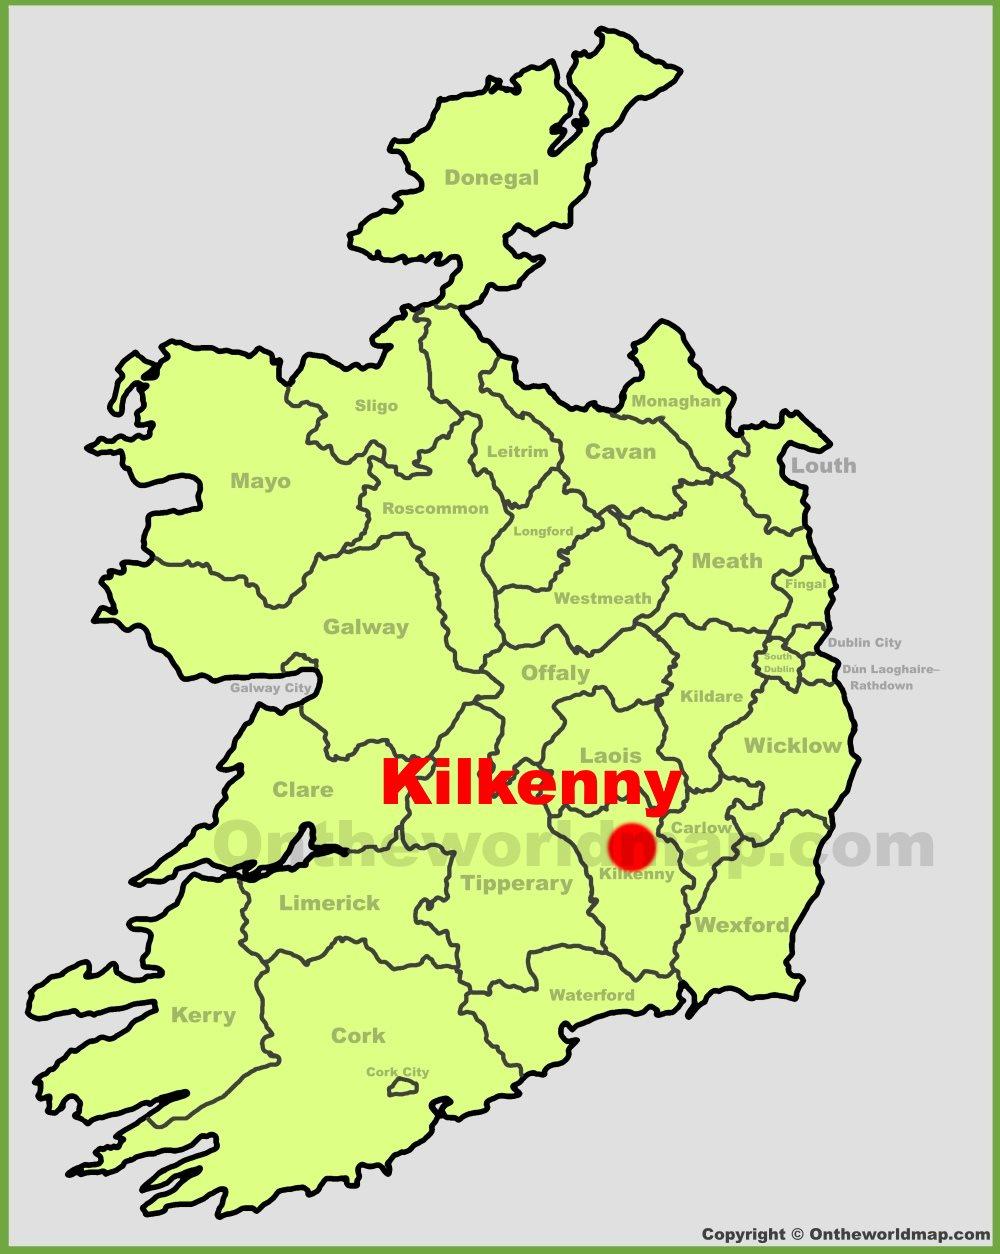 Map Of Ireland Showing Kilkenny.Kilkenny Location On The Ireland Map